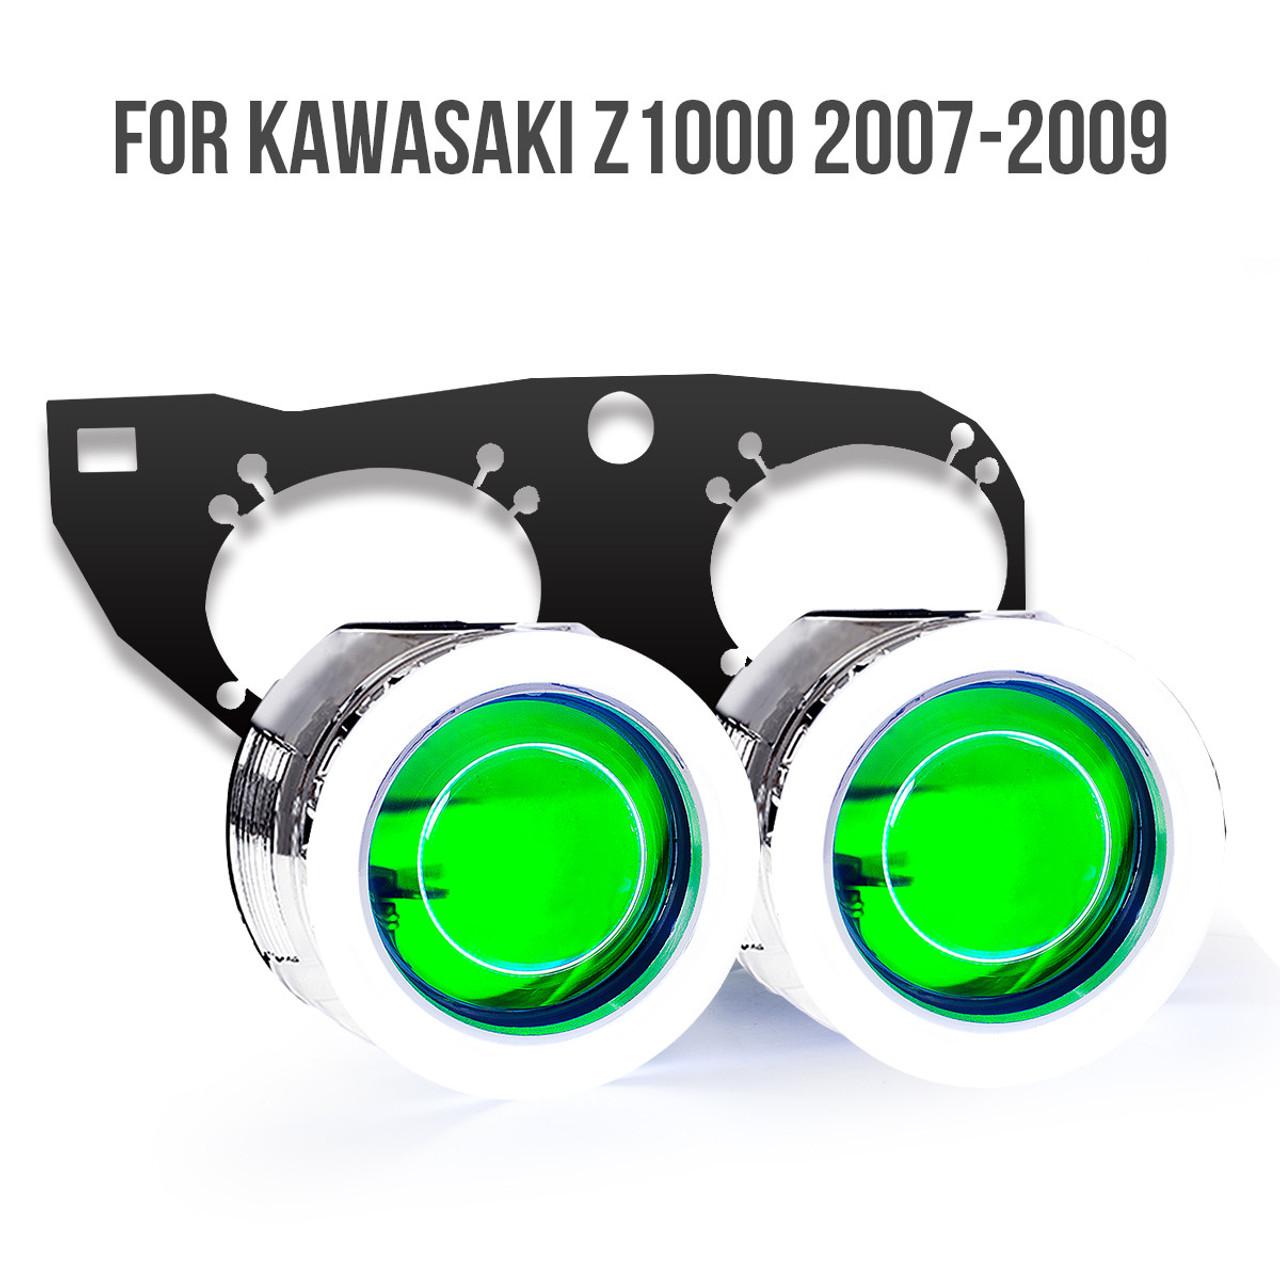 Kawasaki Z1000 Hid Projector Kit 2007 2008 2009 Wiring Diagram